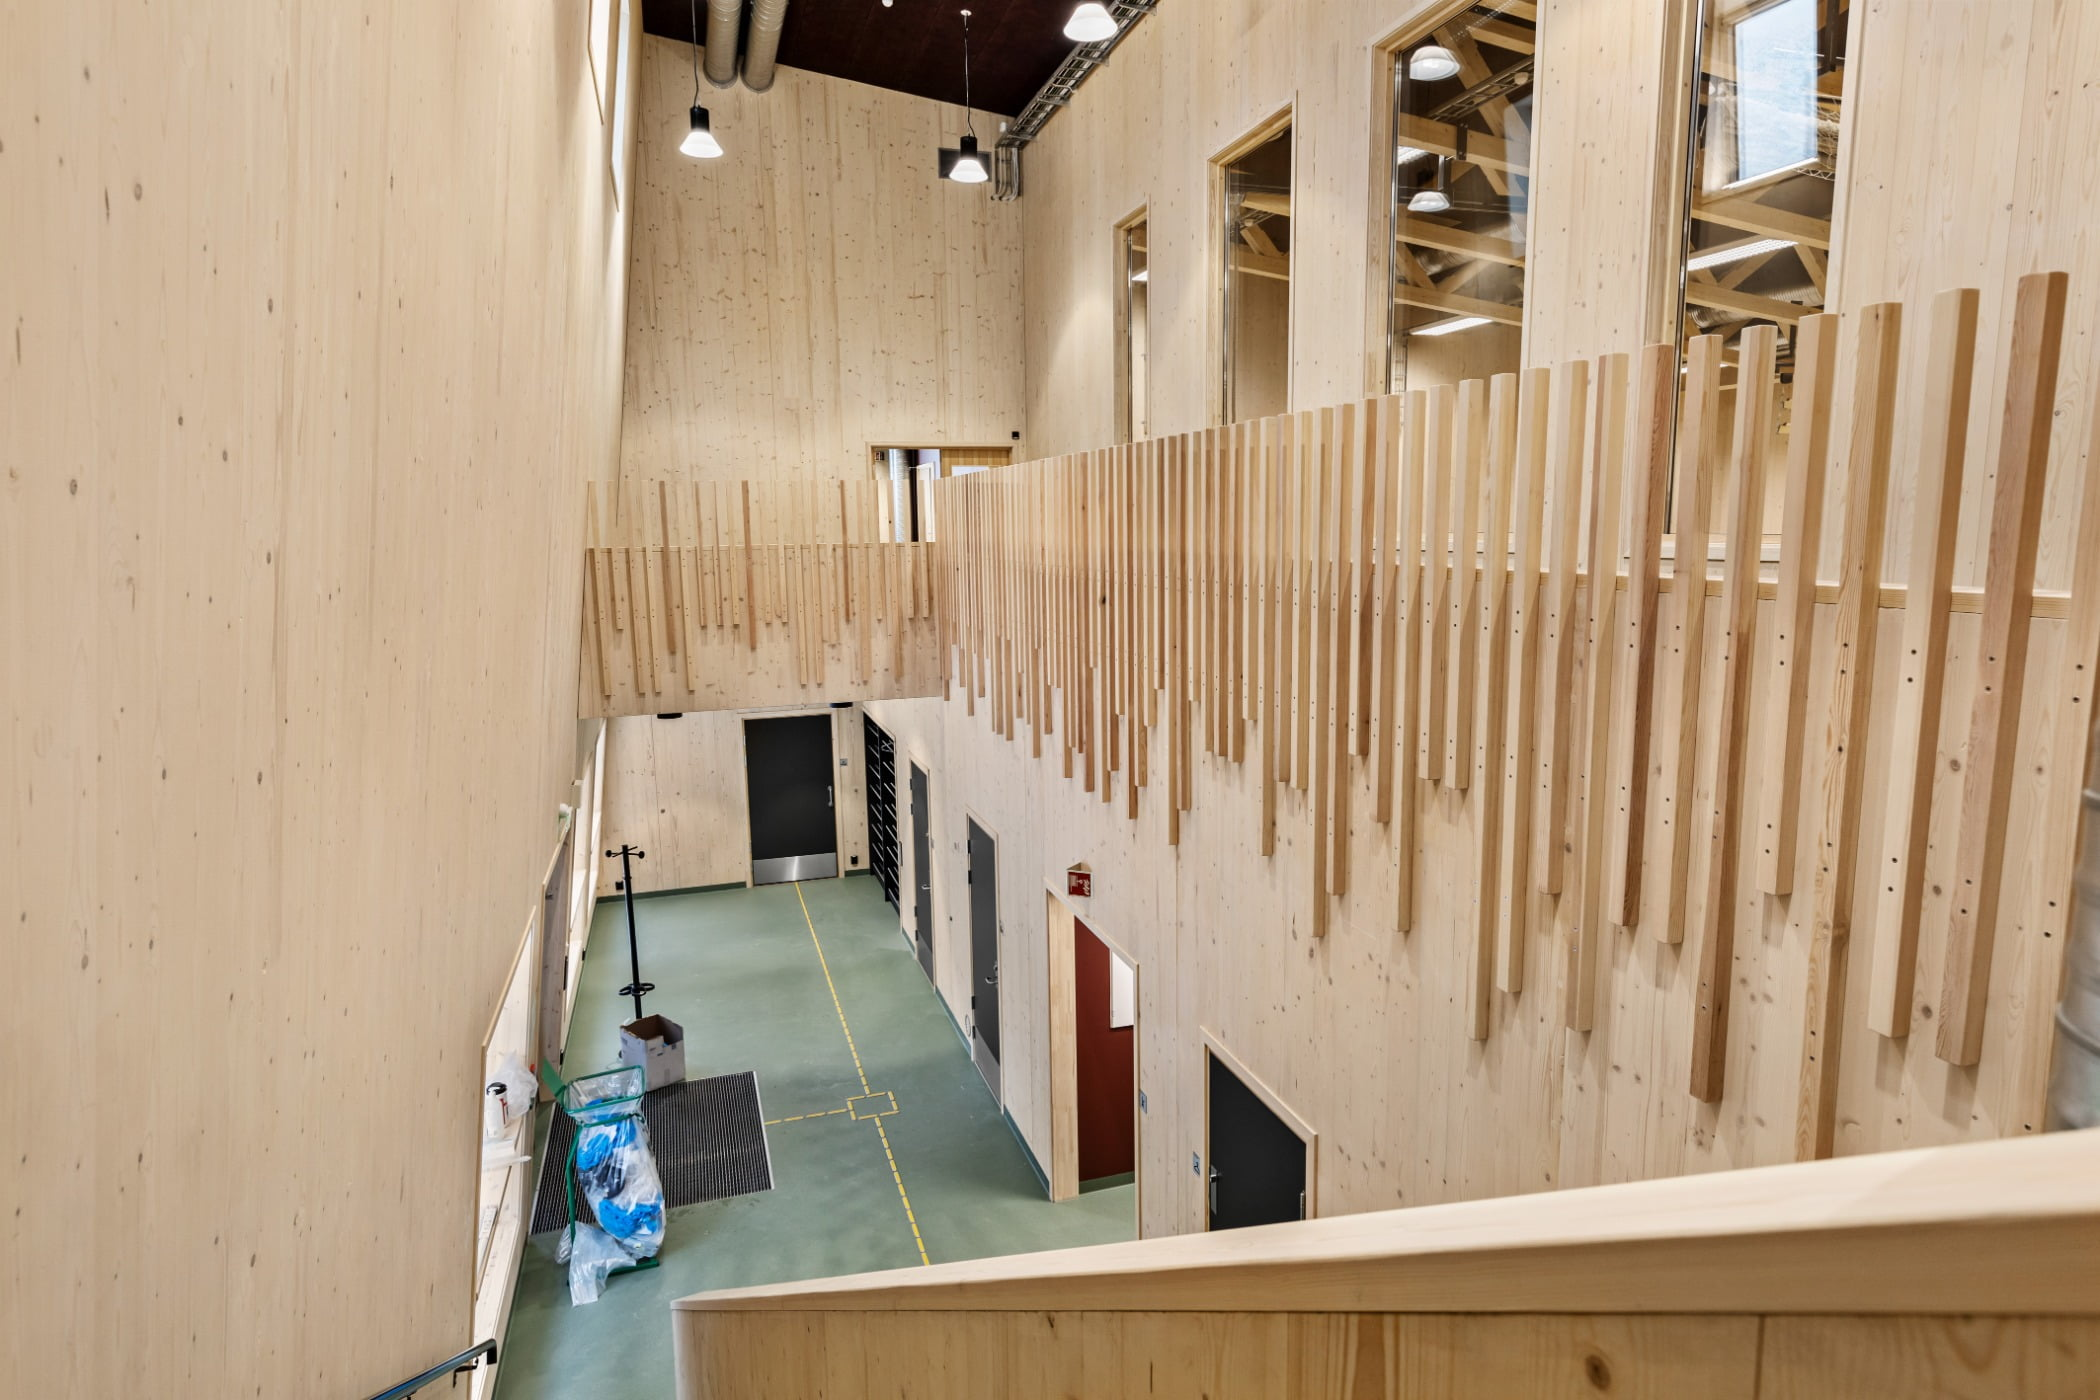 Interior design, Material property, Wood, Flooring, Floor, Wall